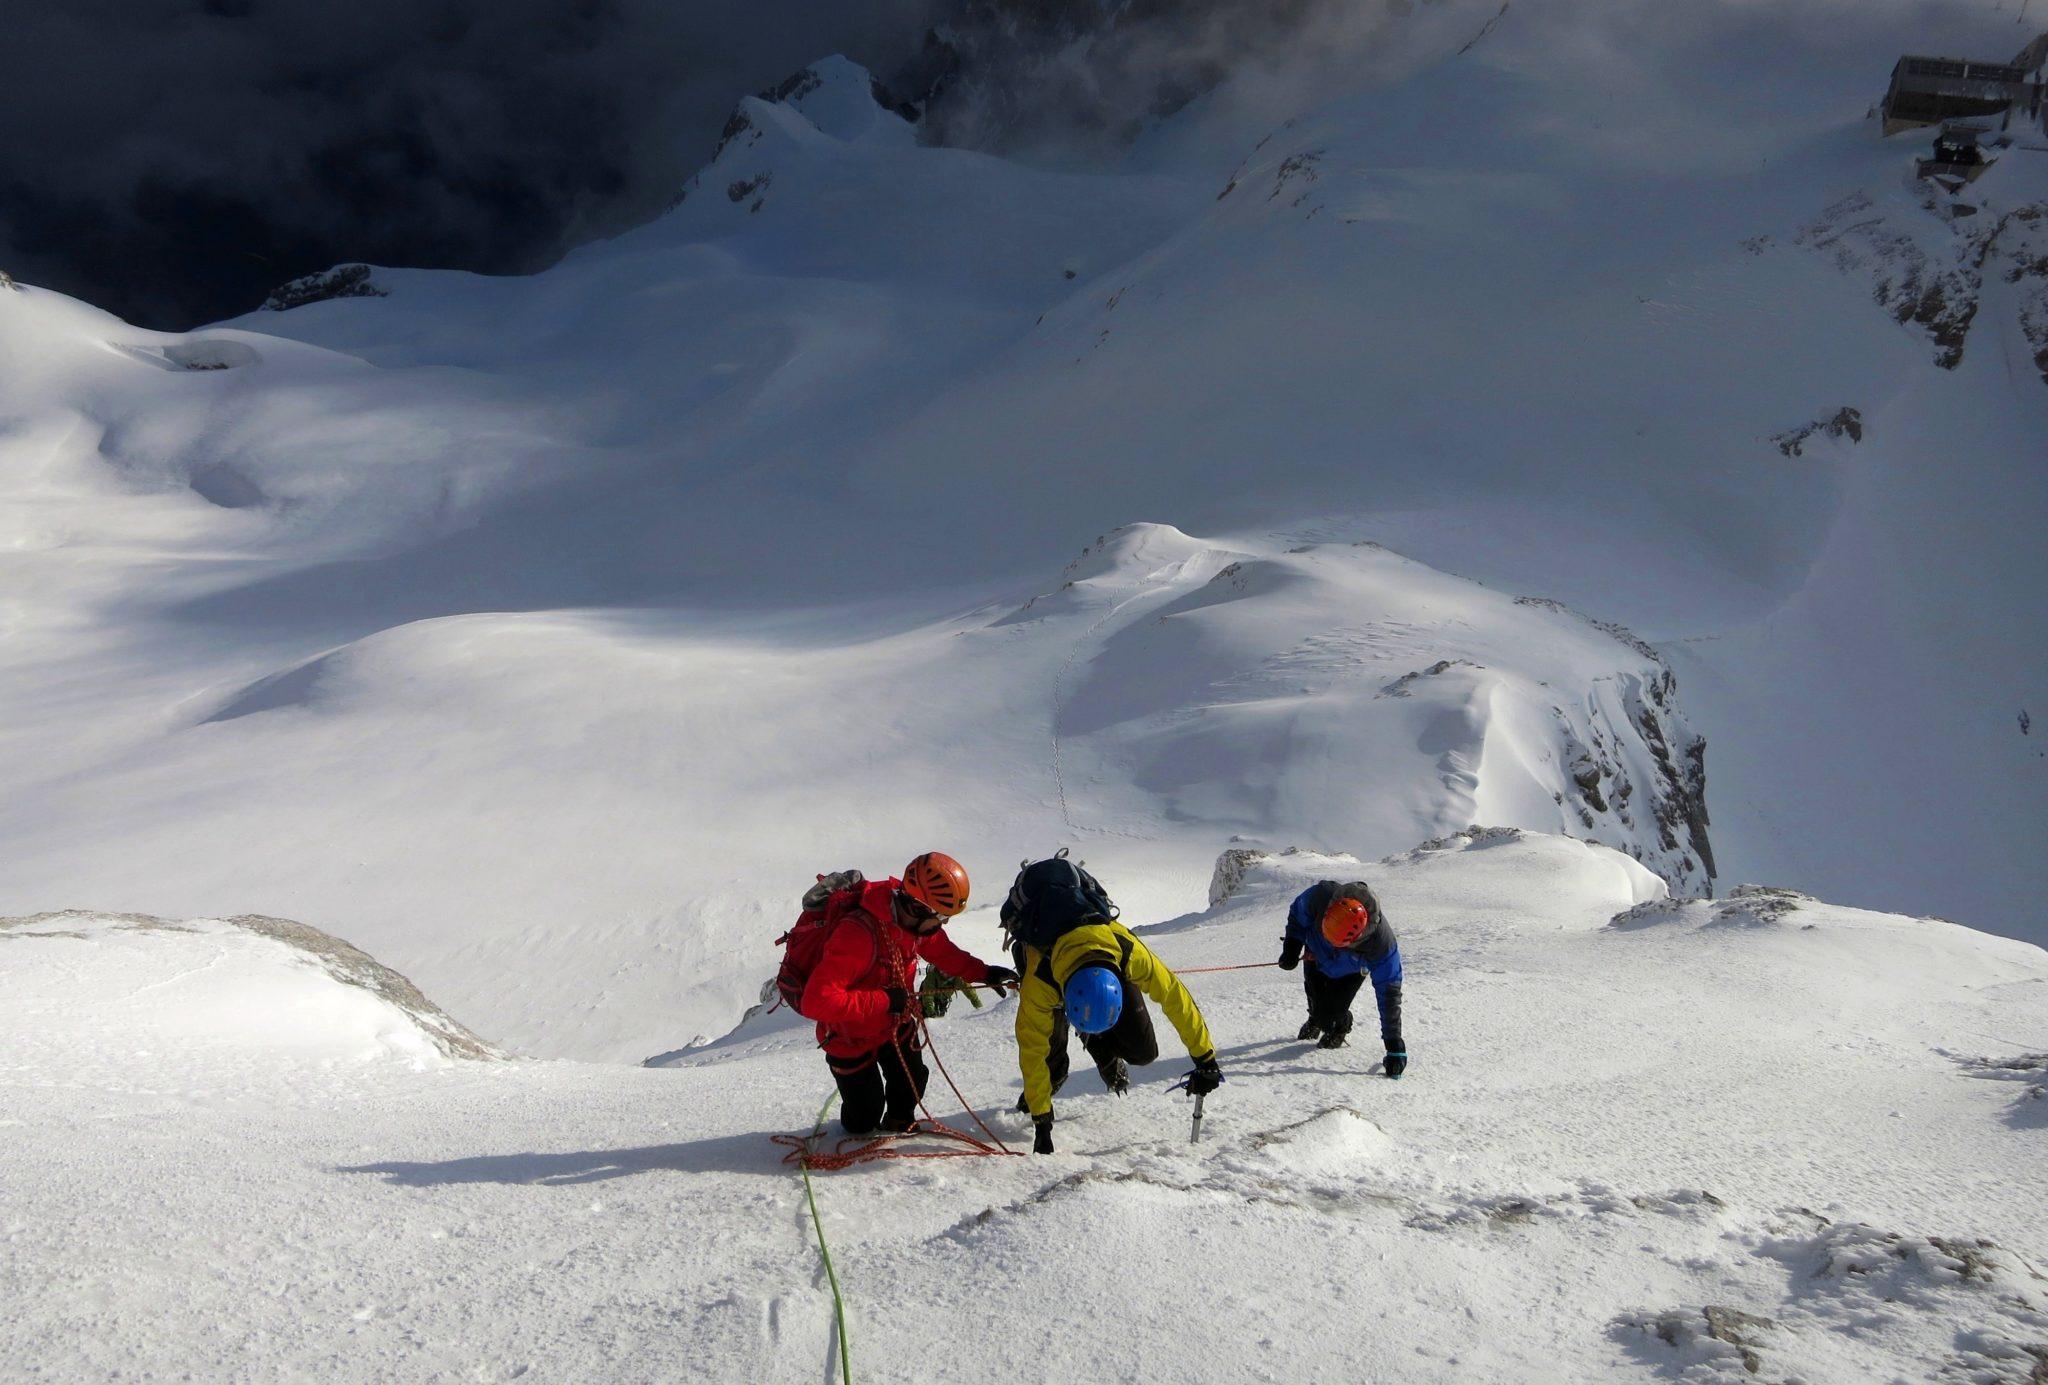 Climbing Triglav in January-like conditions.